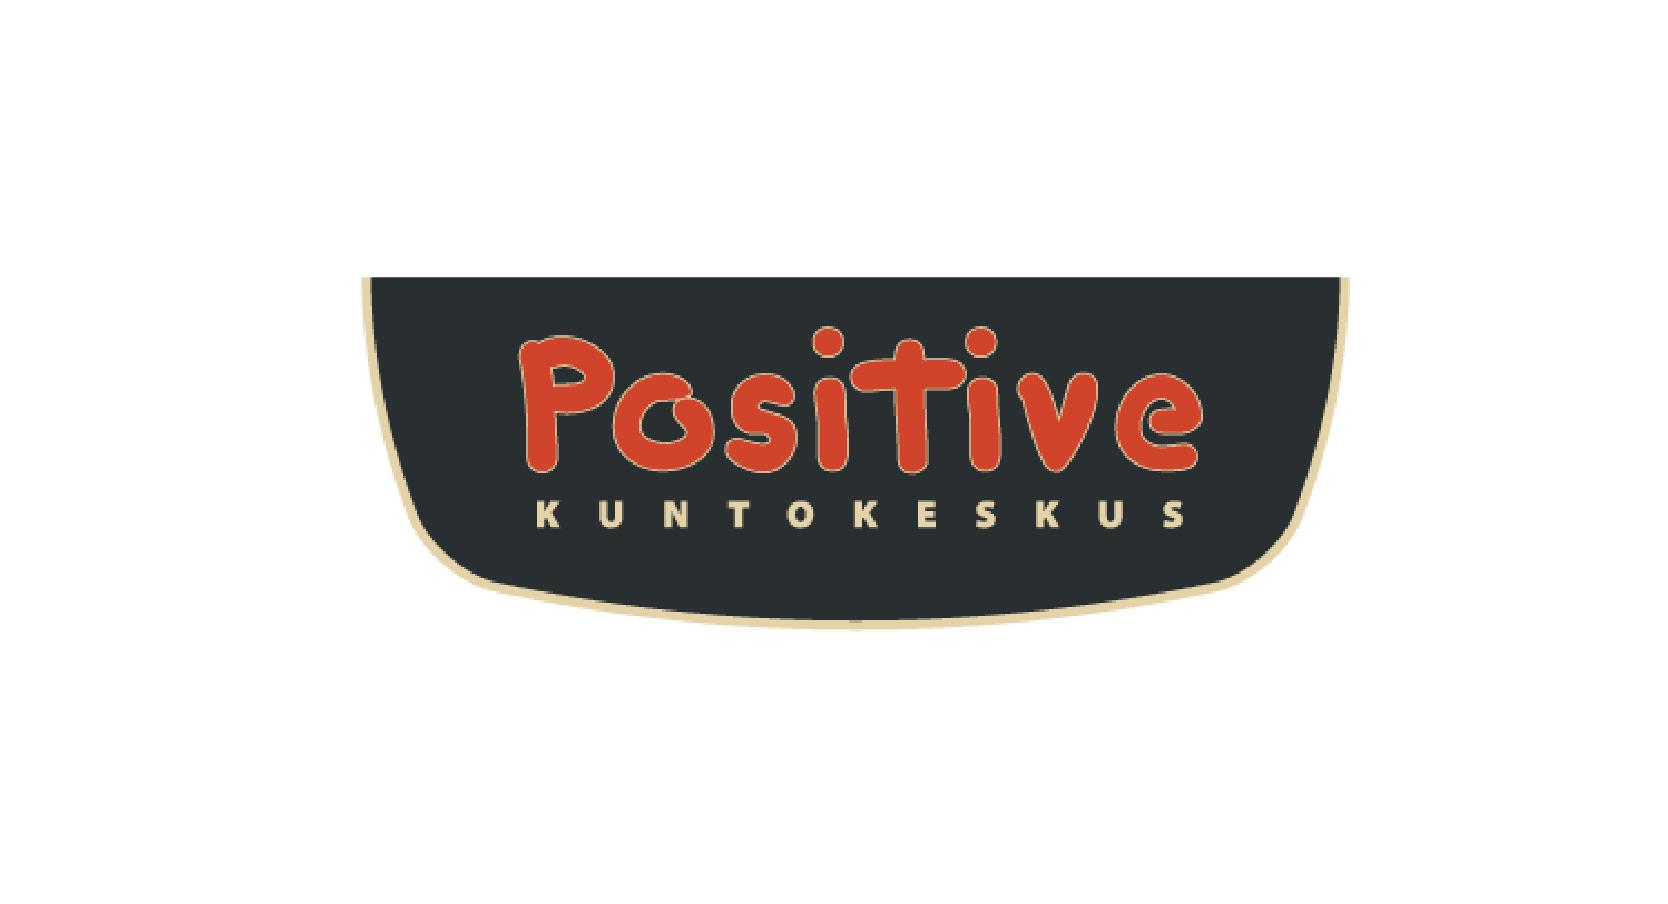 Kuntokeskus Positive